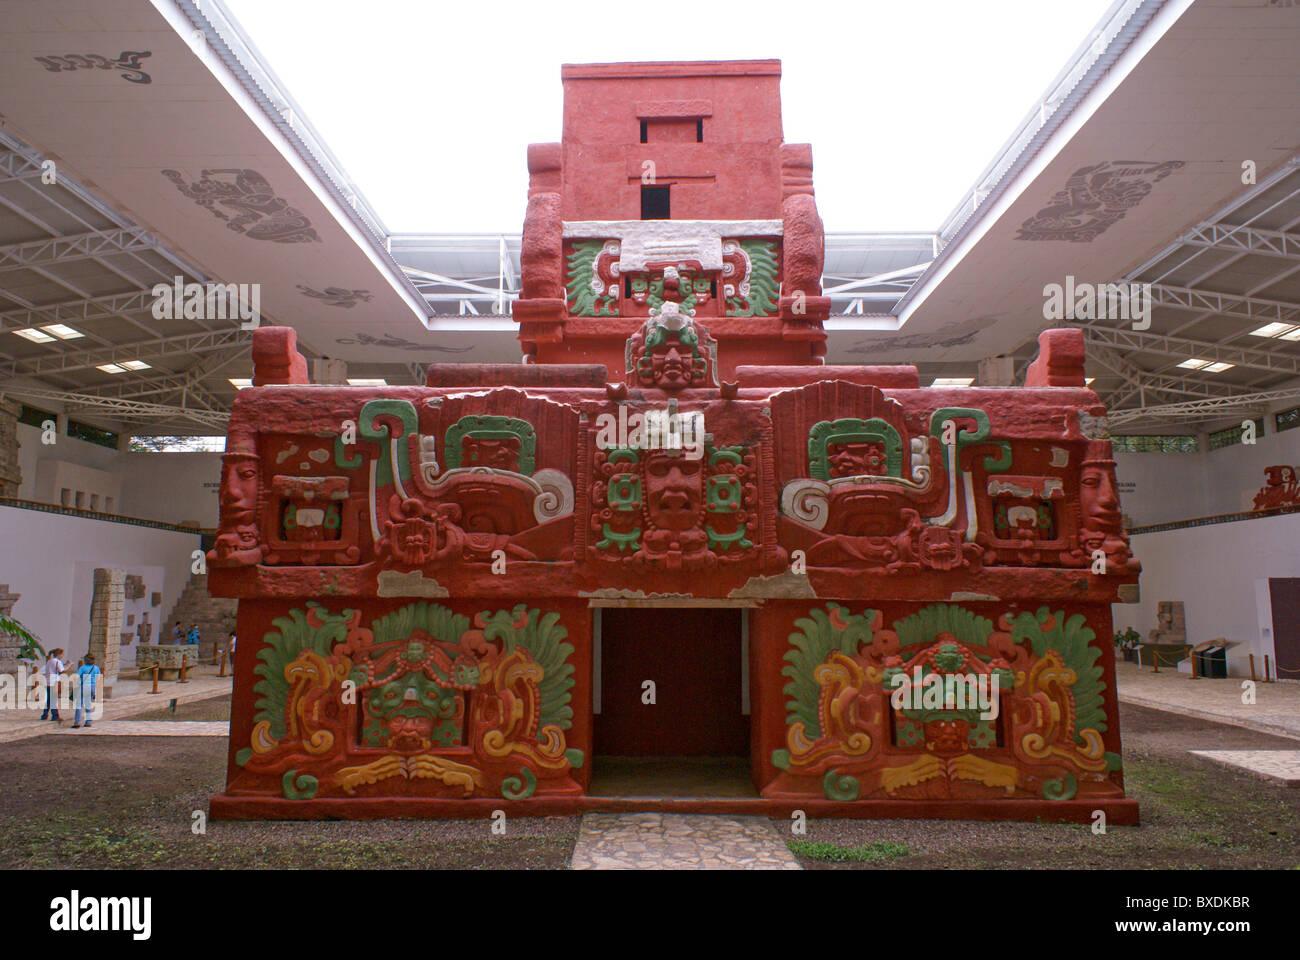 Replica of the Rosalila temple in the Copan Sculpture Museum at the Mayan ruins of Copan, Honduras Stock Photo